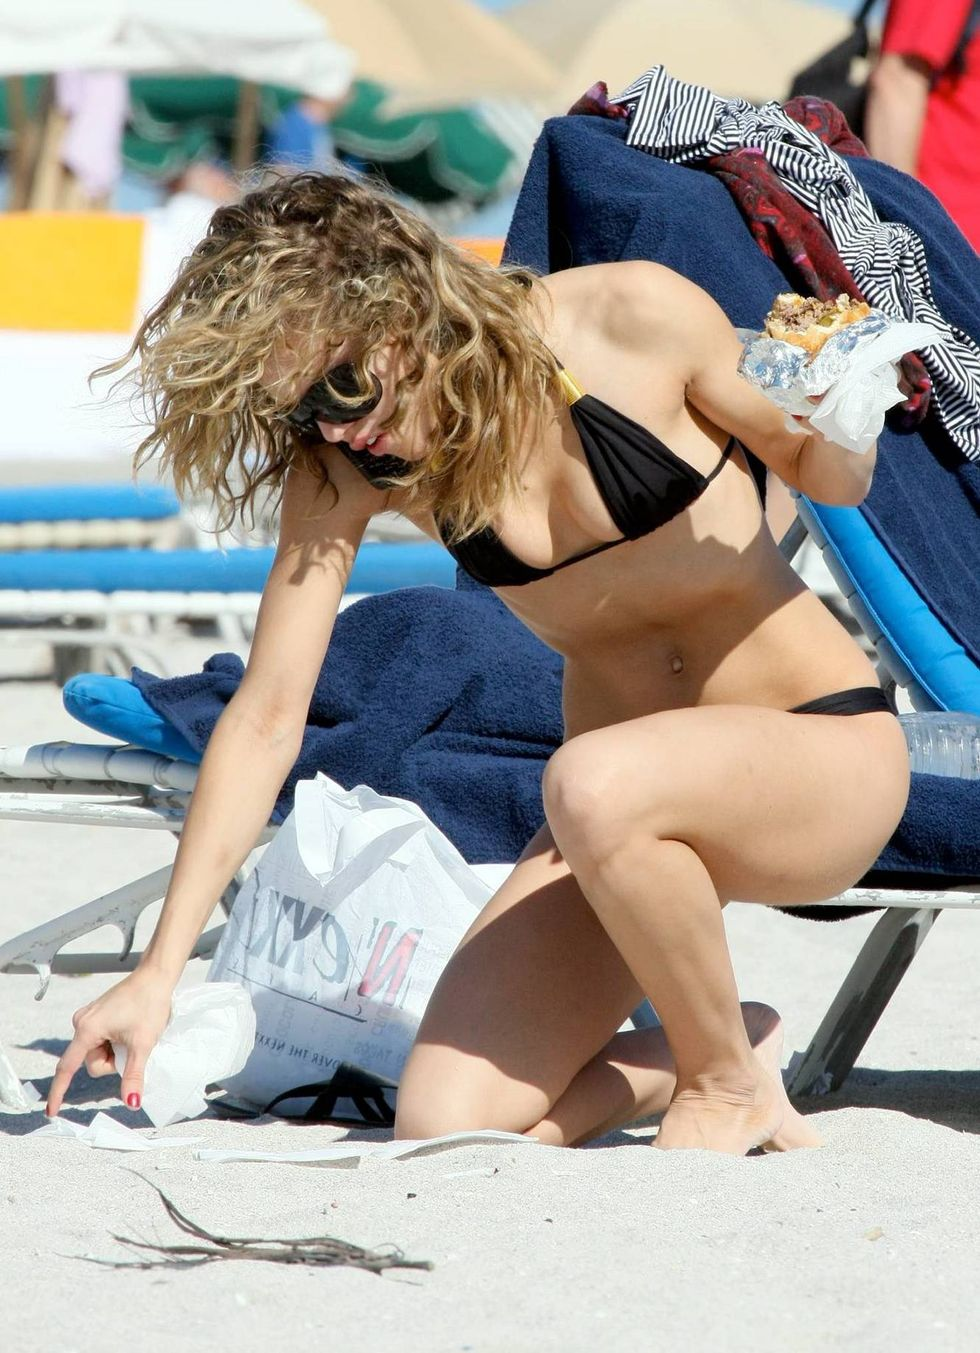 annalynne-mccord-in-bikini-on-the-beach-in-miami-02